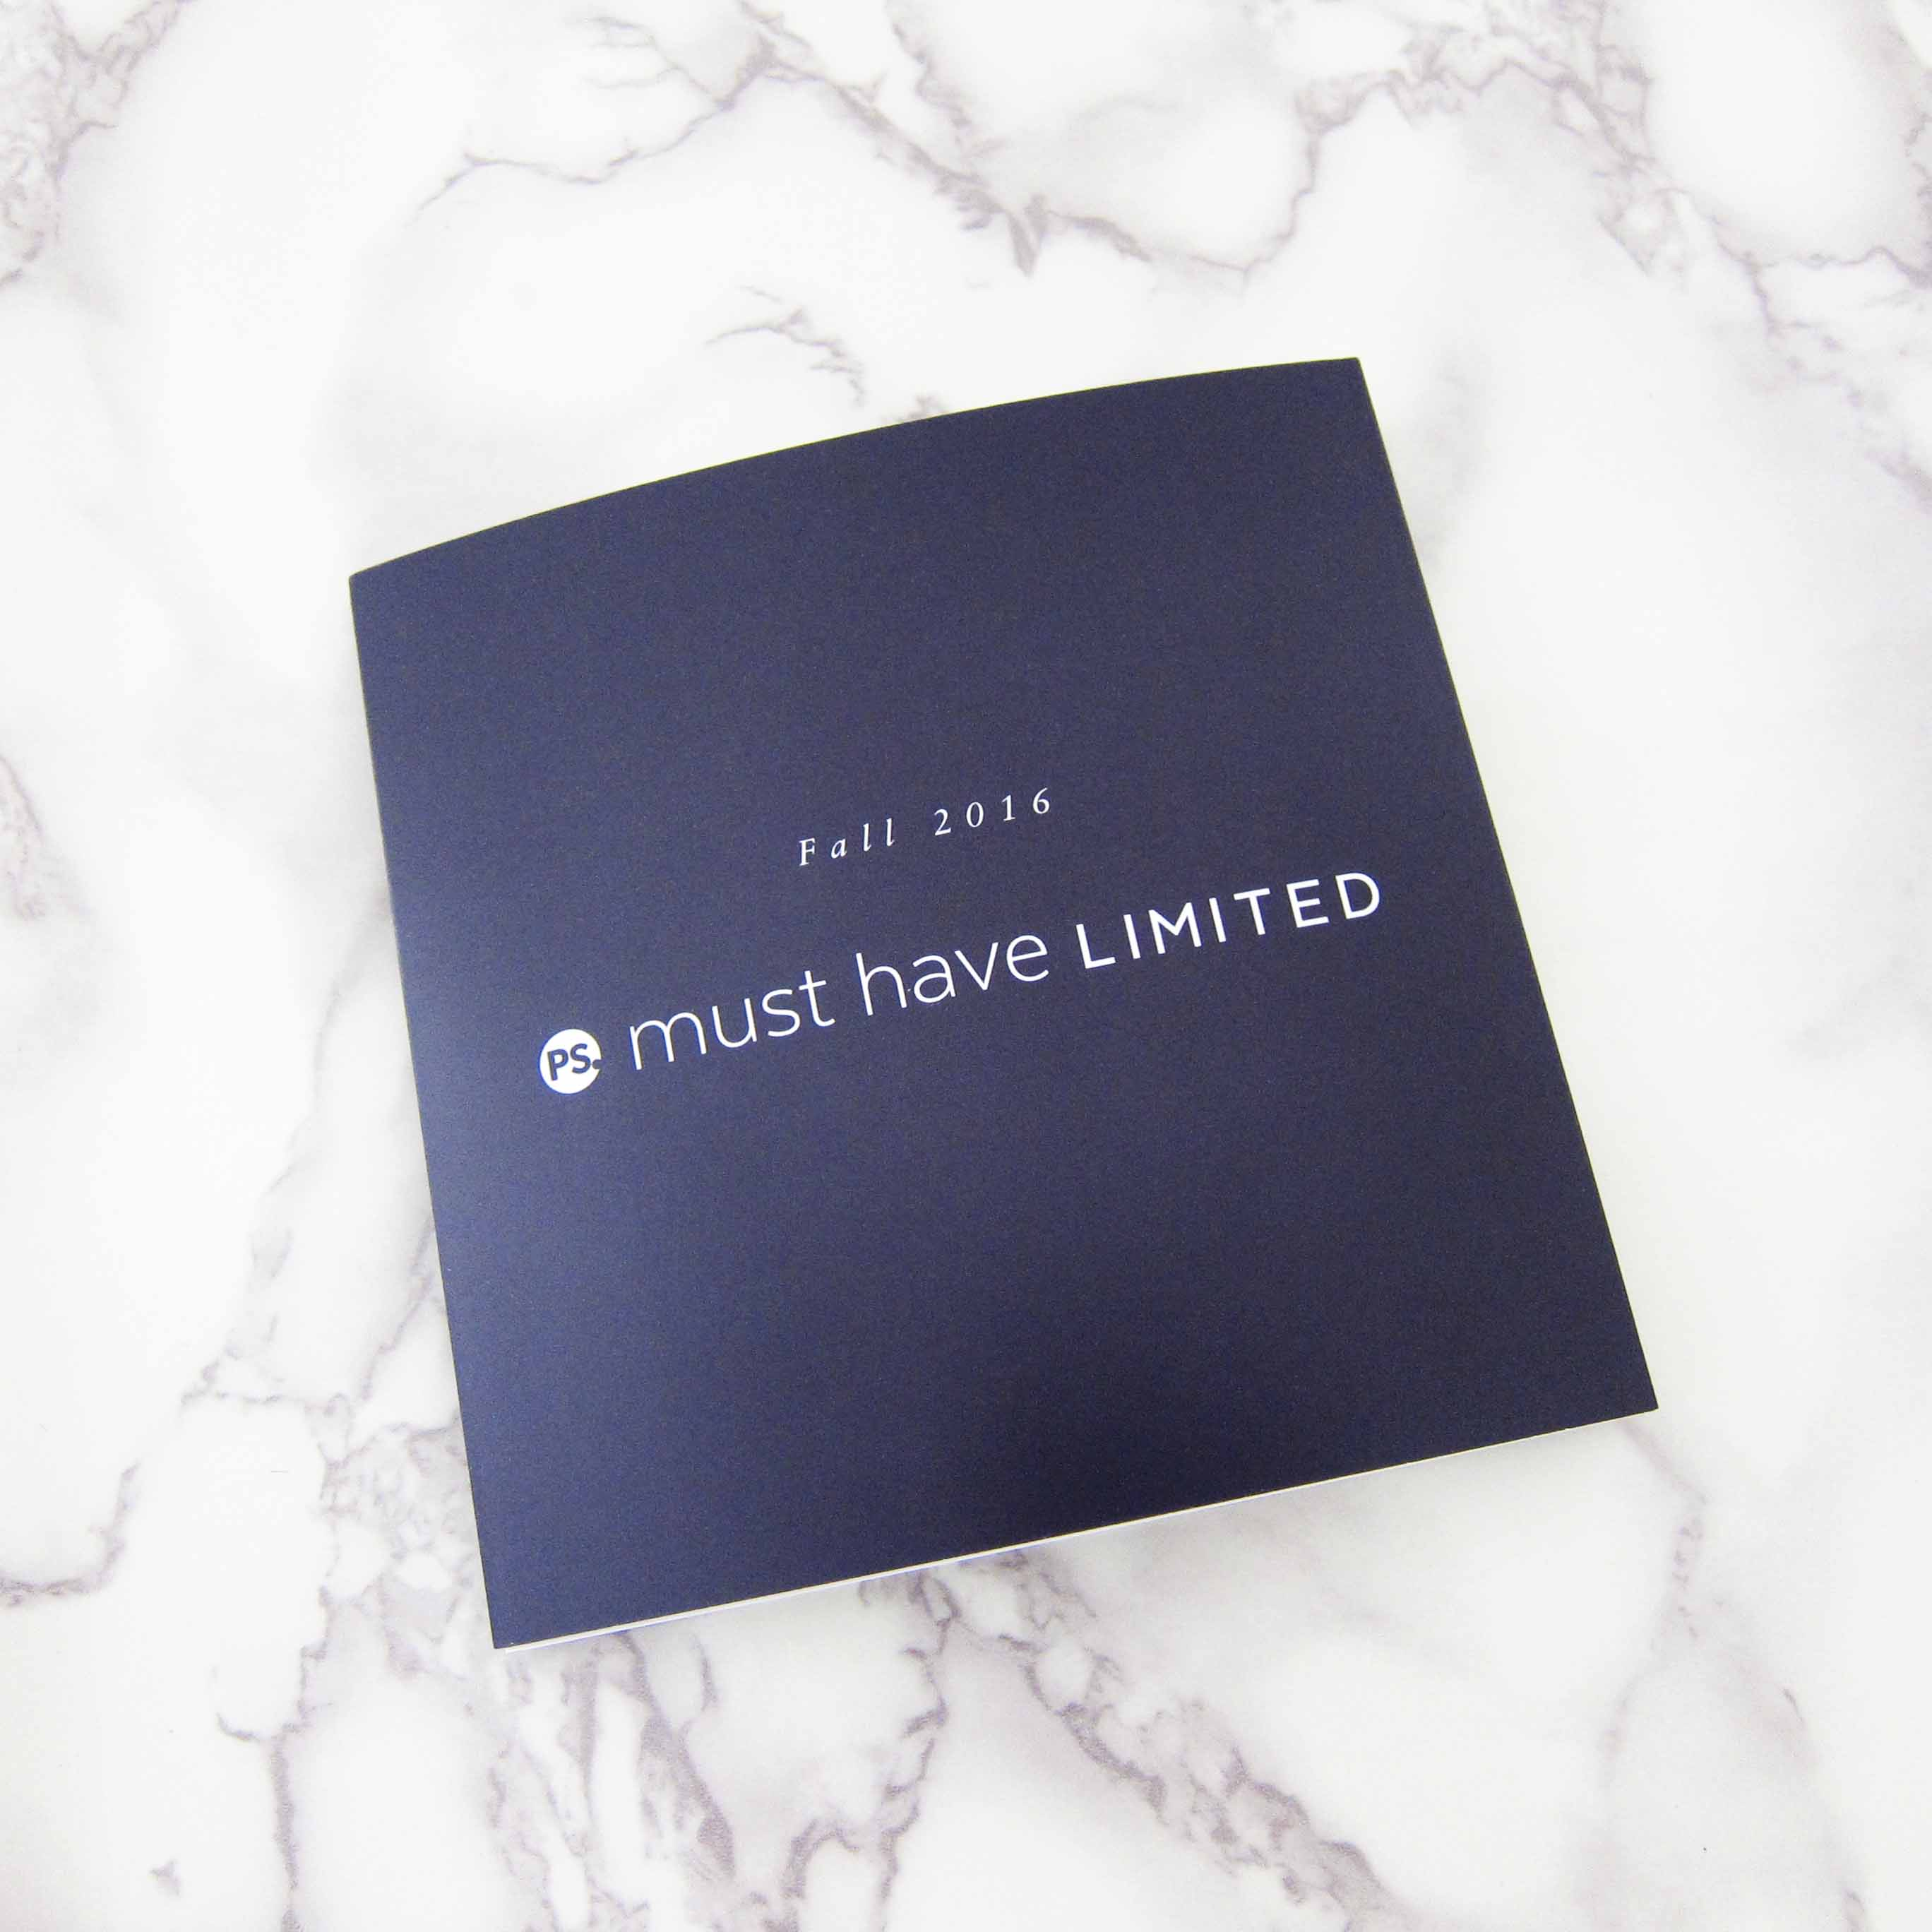 Popsugar Limited Edition Fall 2016 Info Card